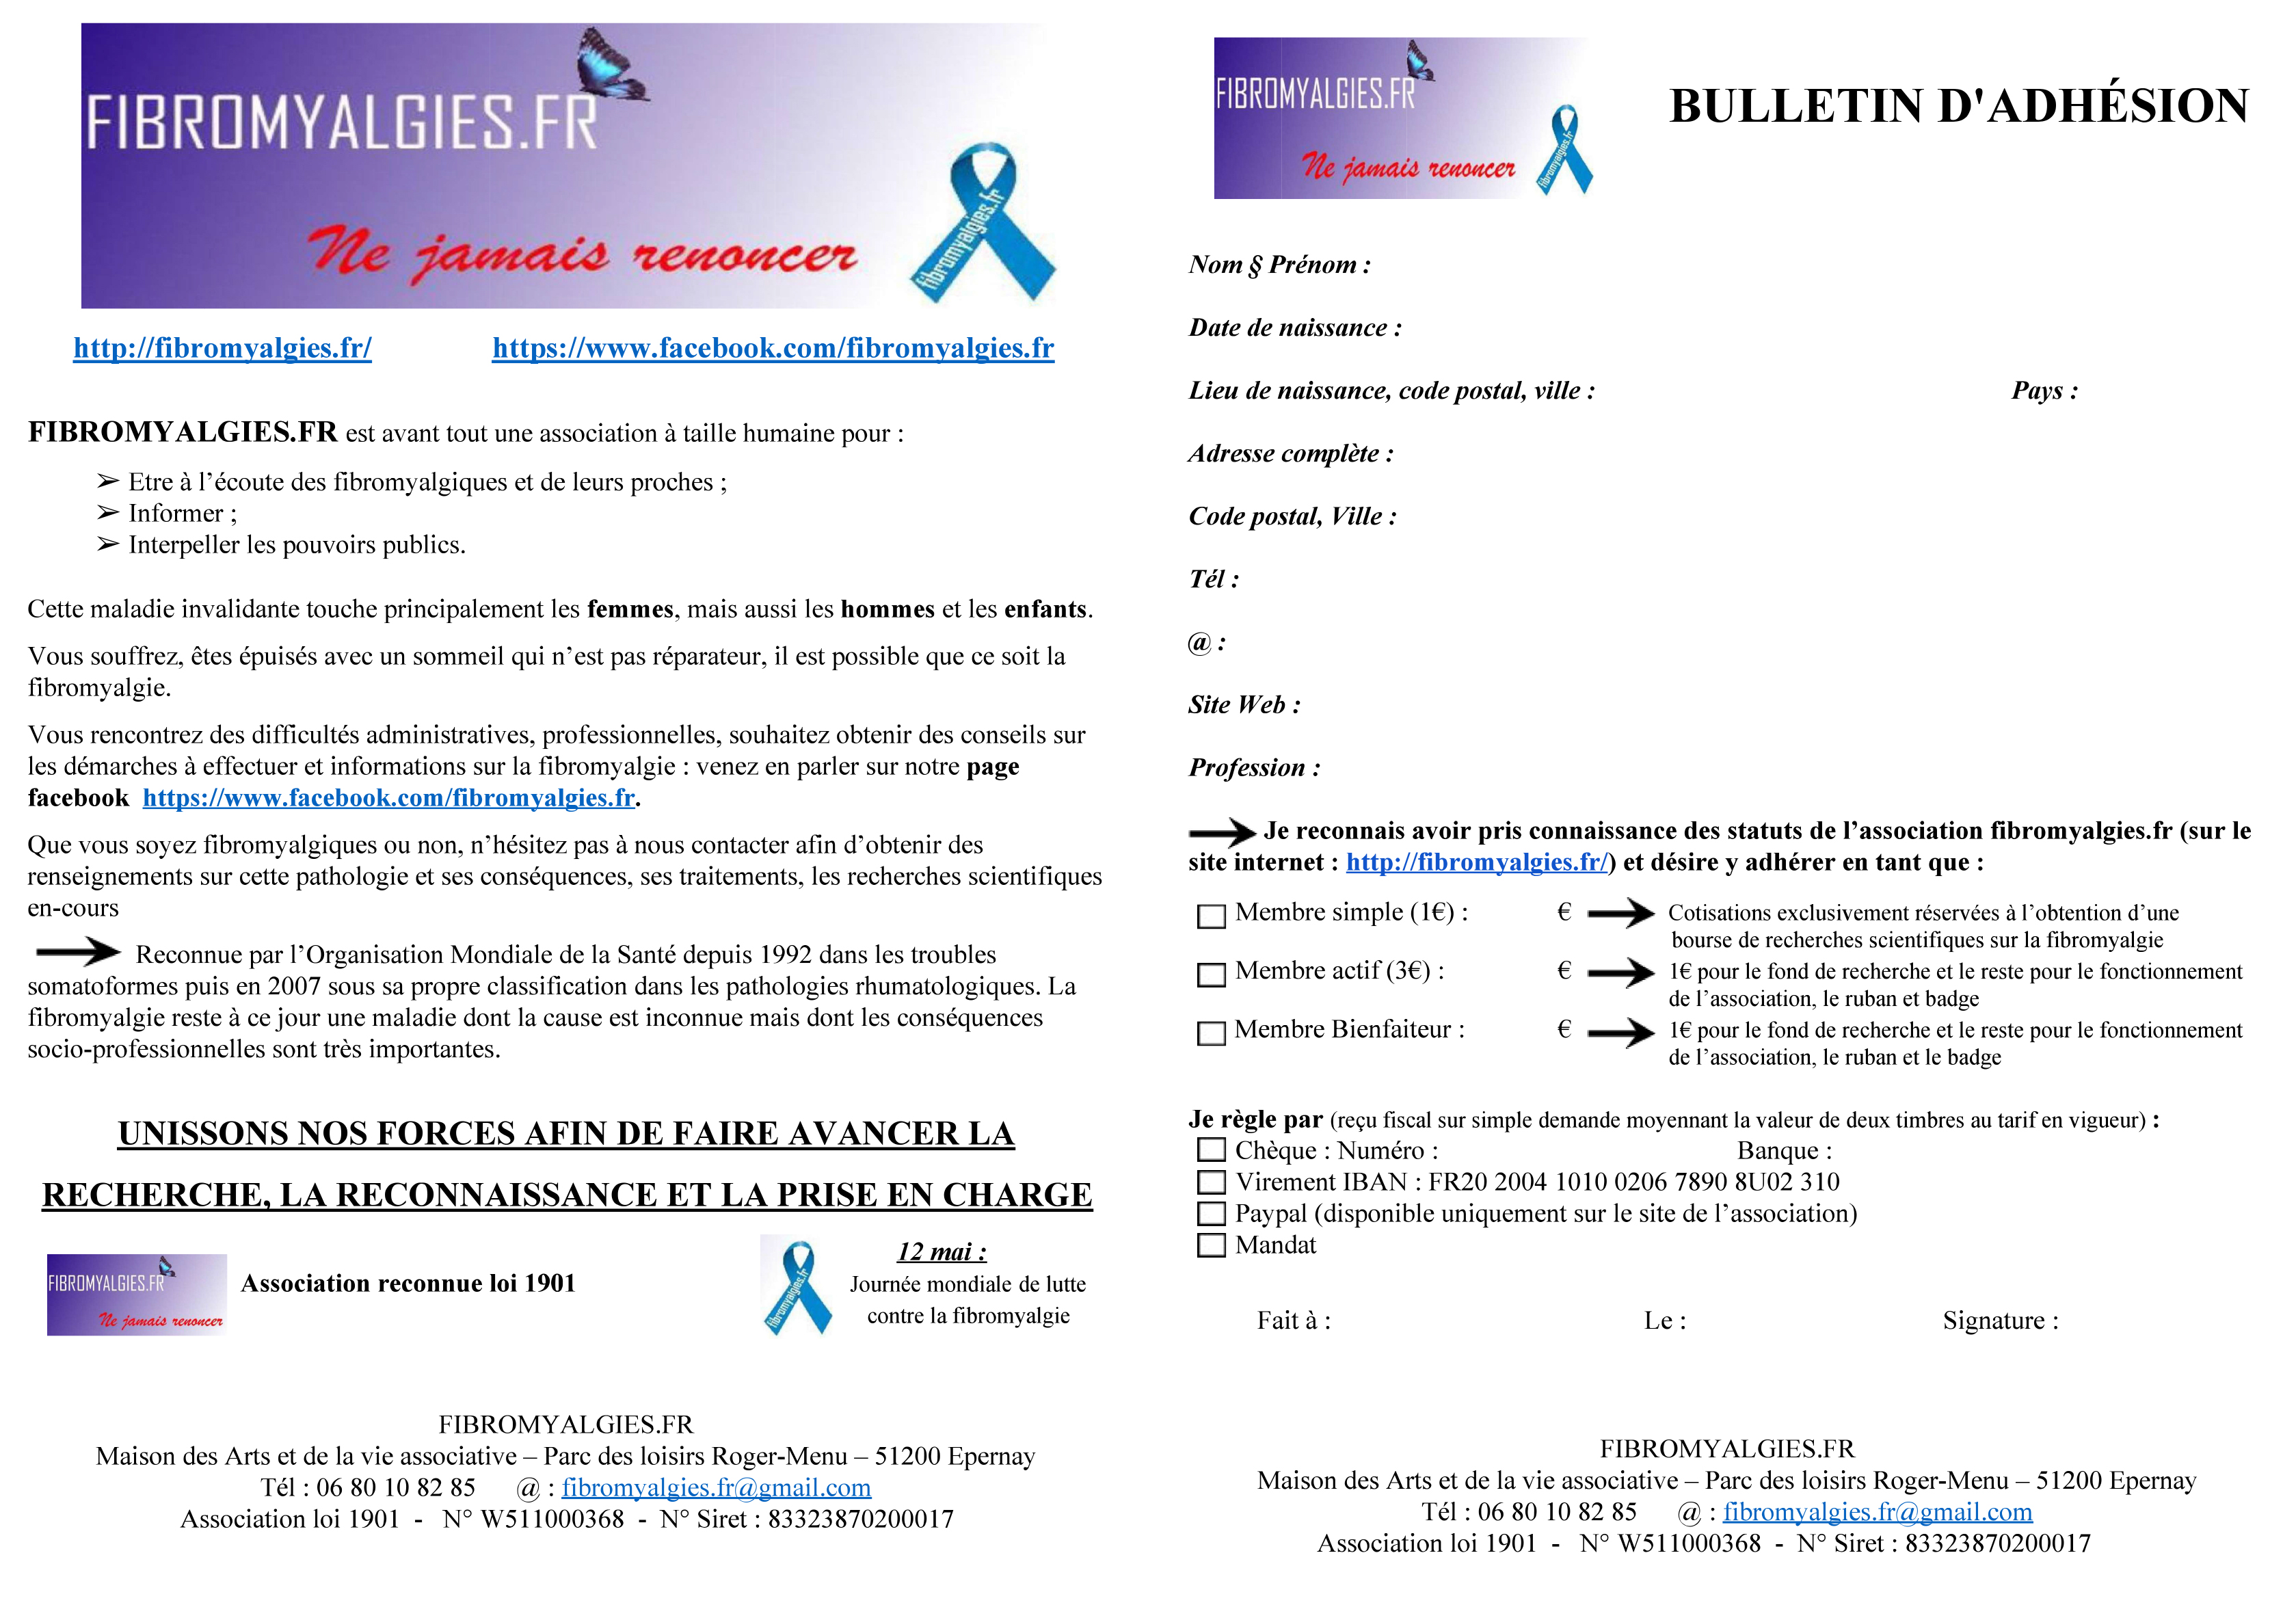 Adhésion à Fibromyalgies.fr